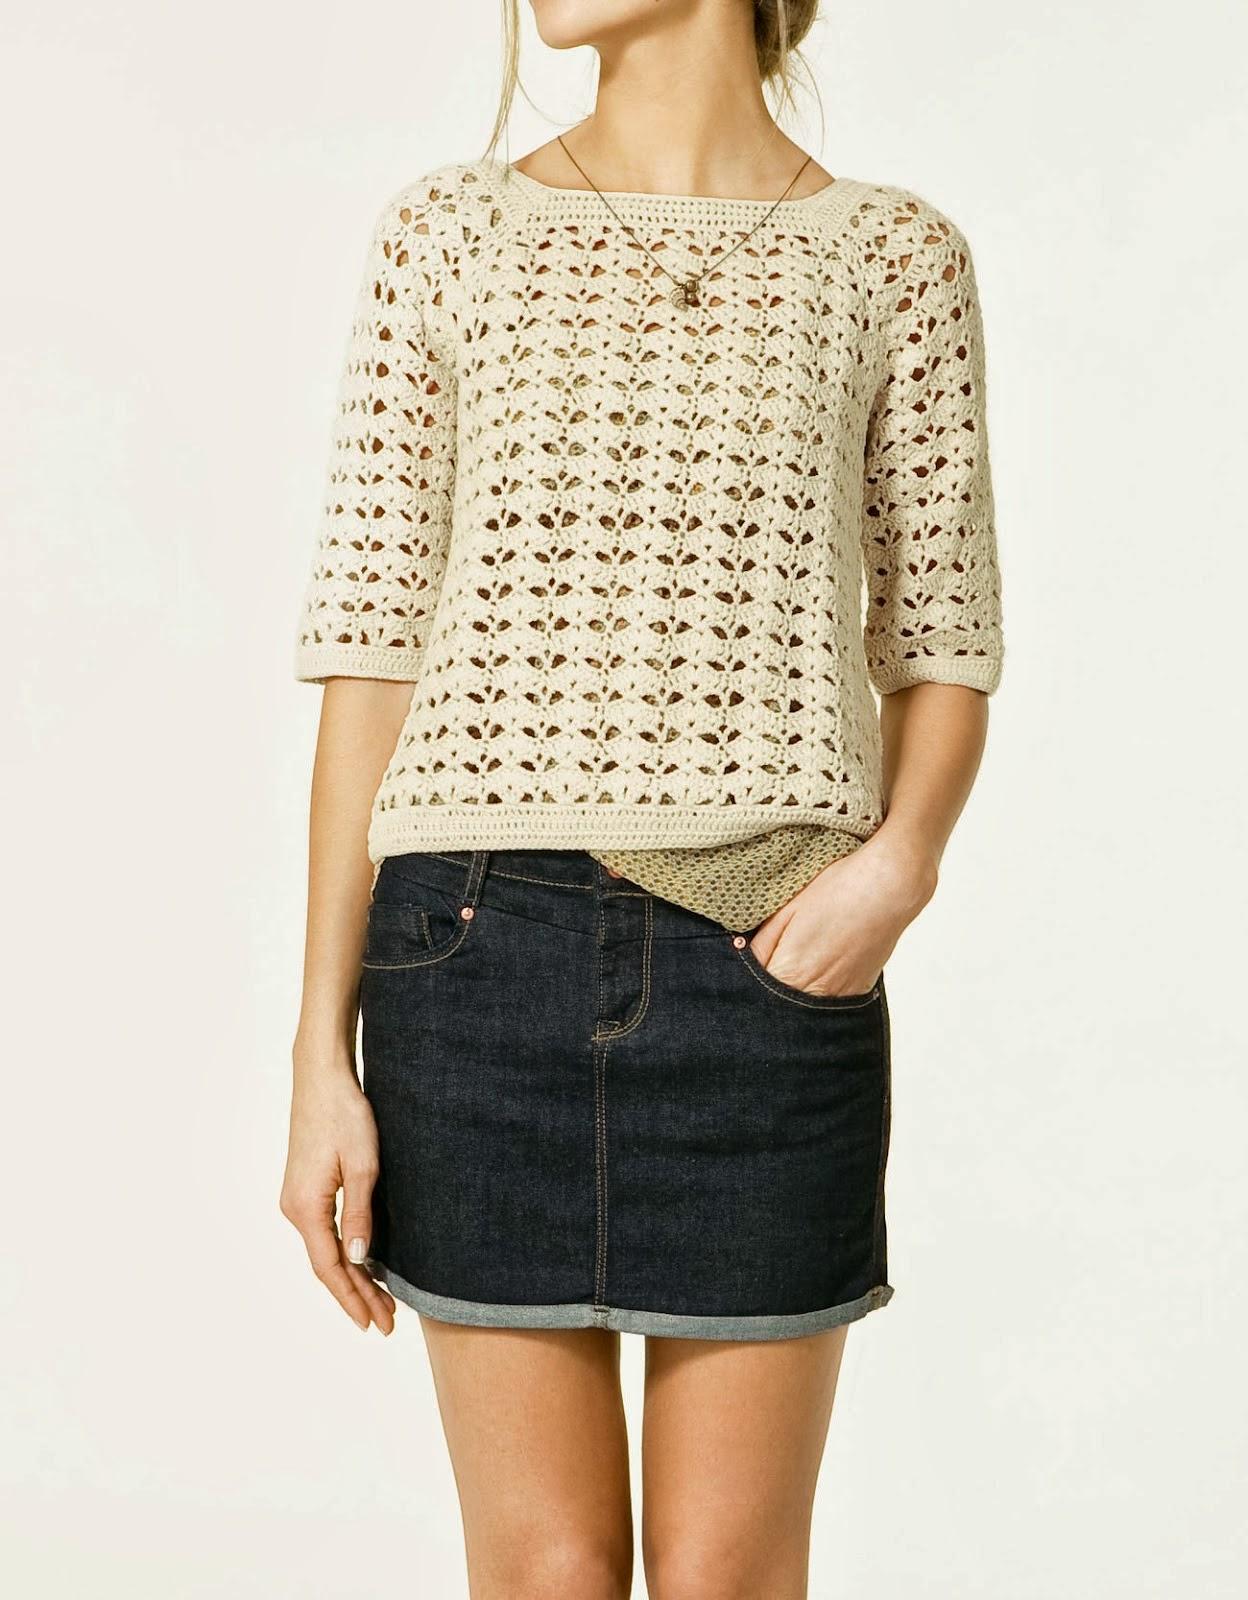 DISEÑOS SIN PaTRON | Crochet tejidos